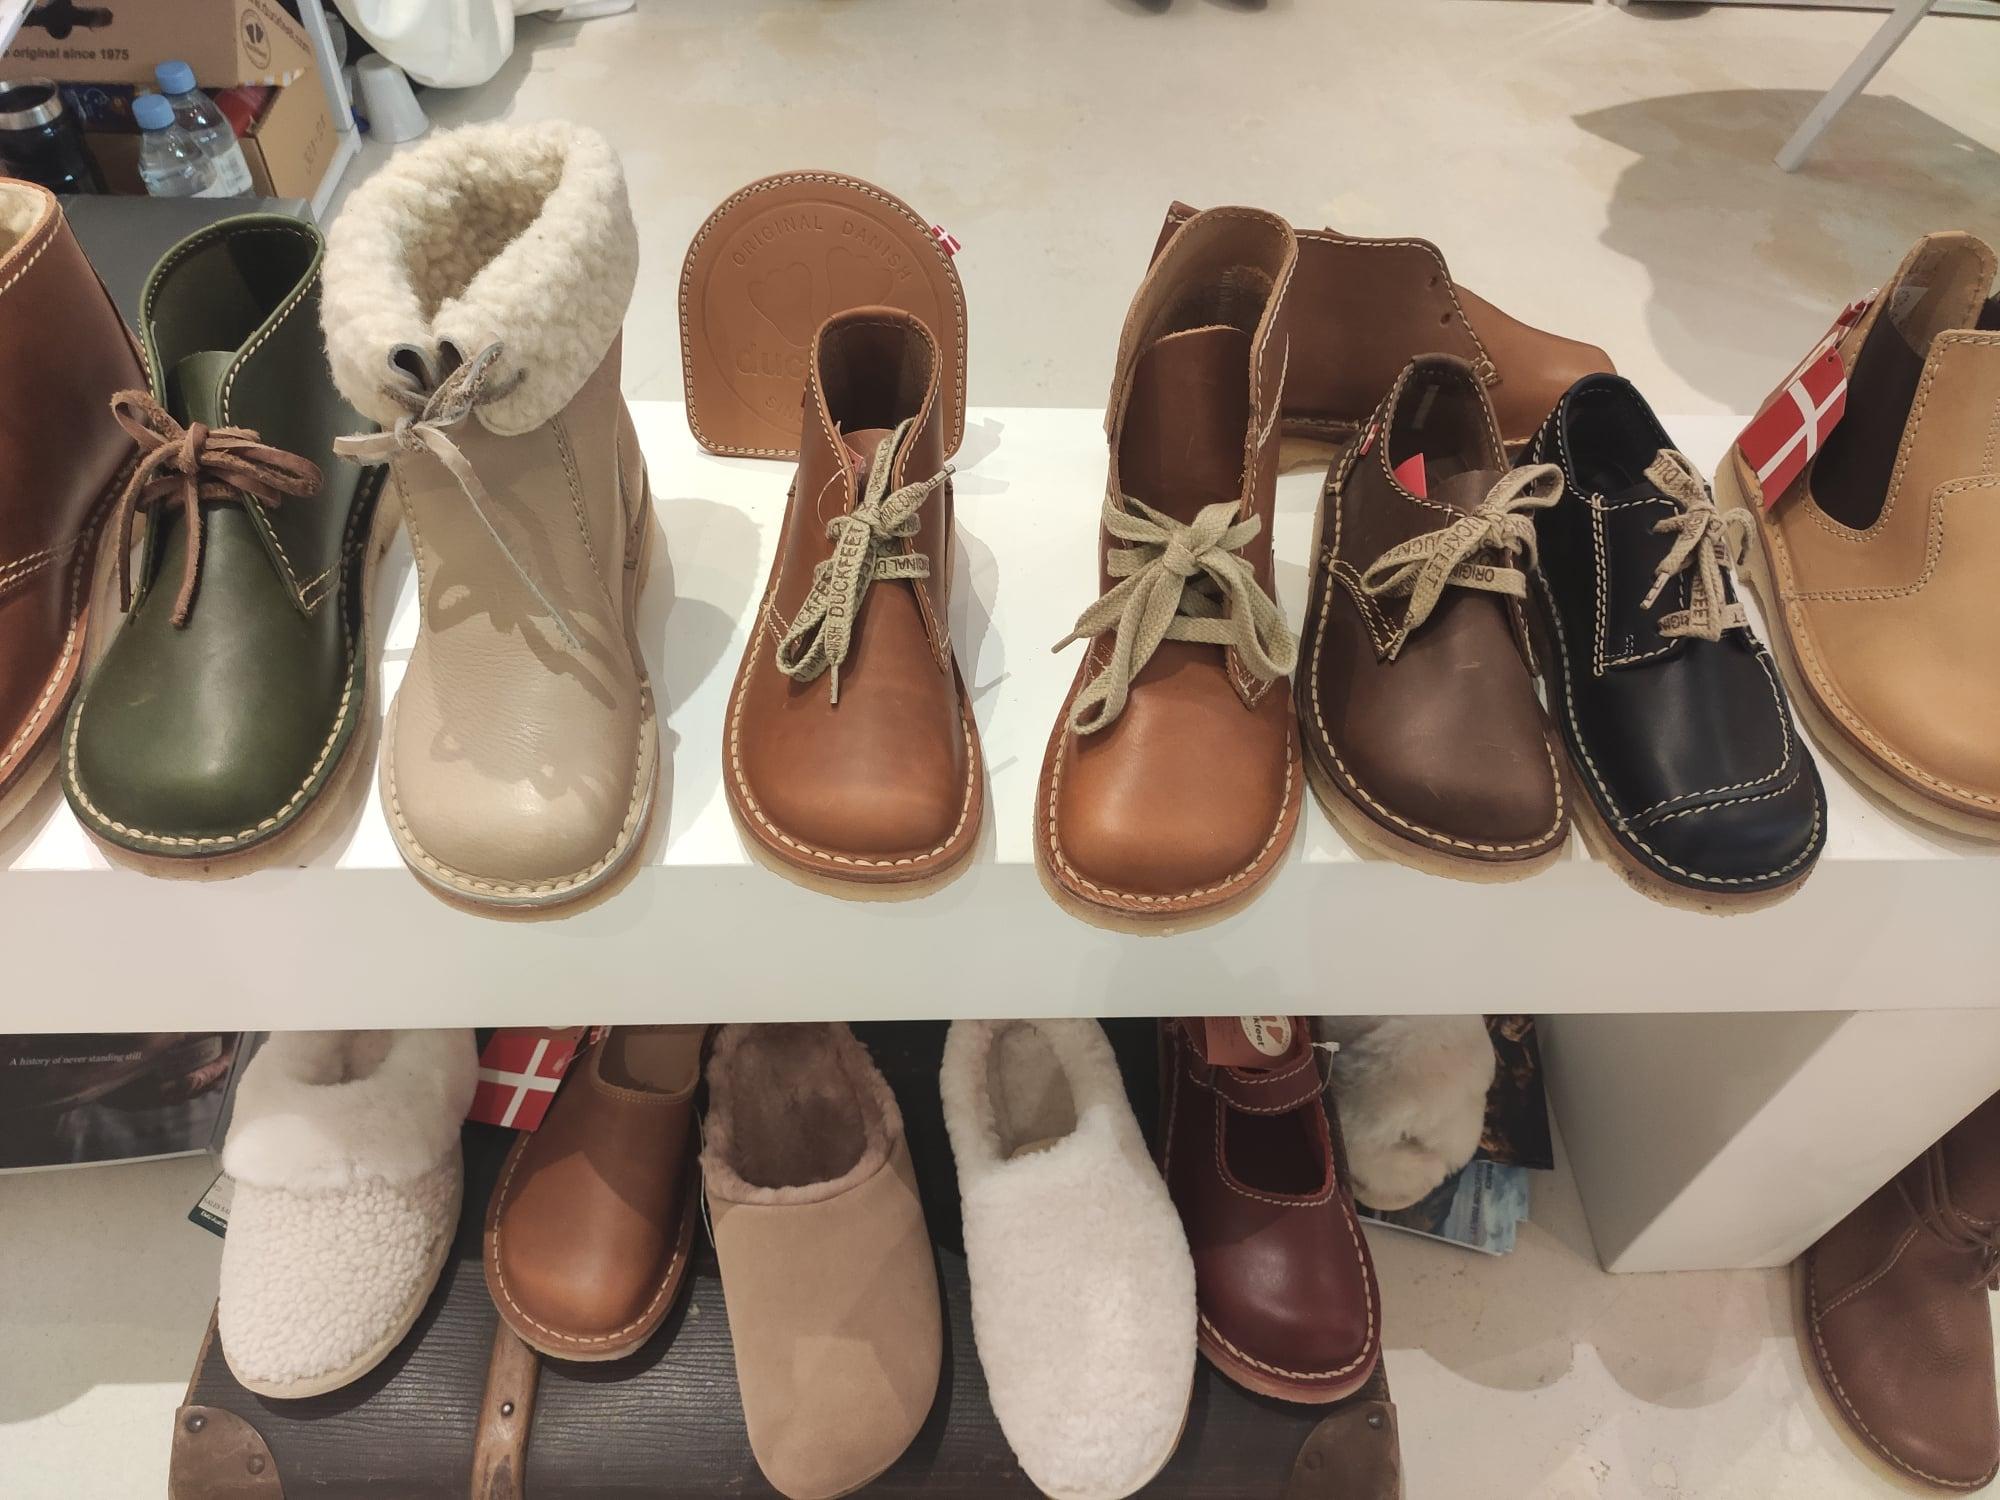 Chaussures et chaussons (Duckfeet)